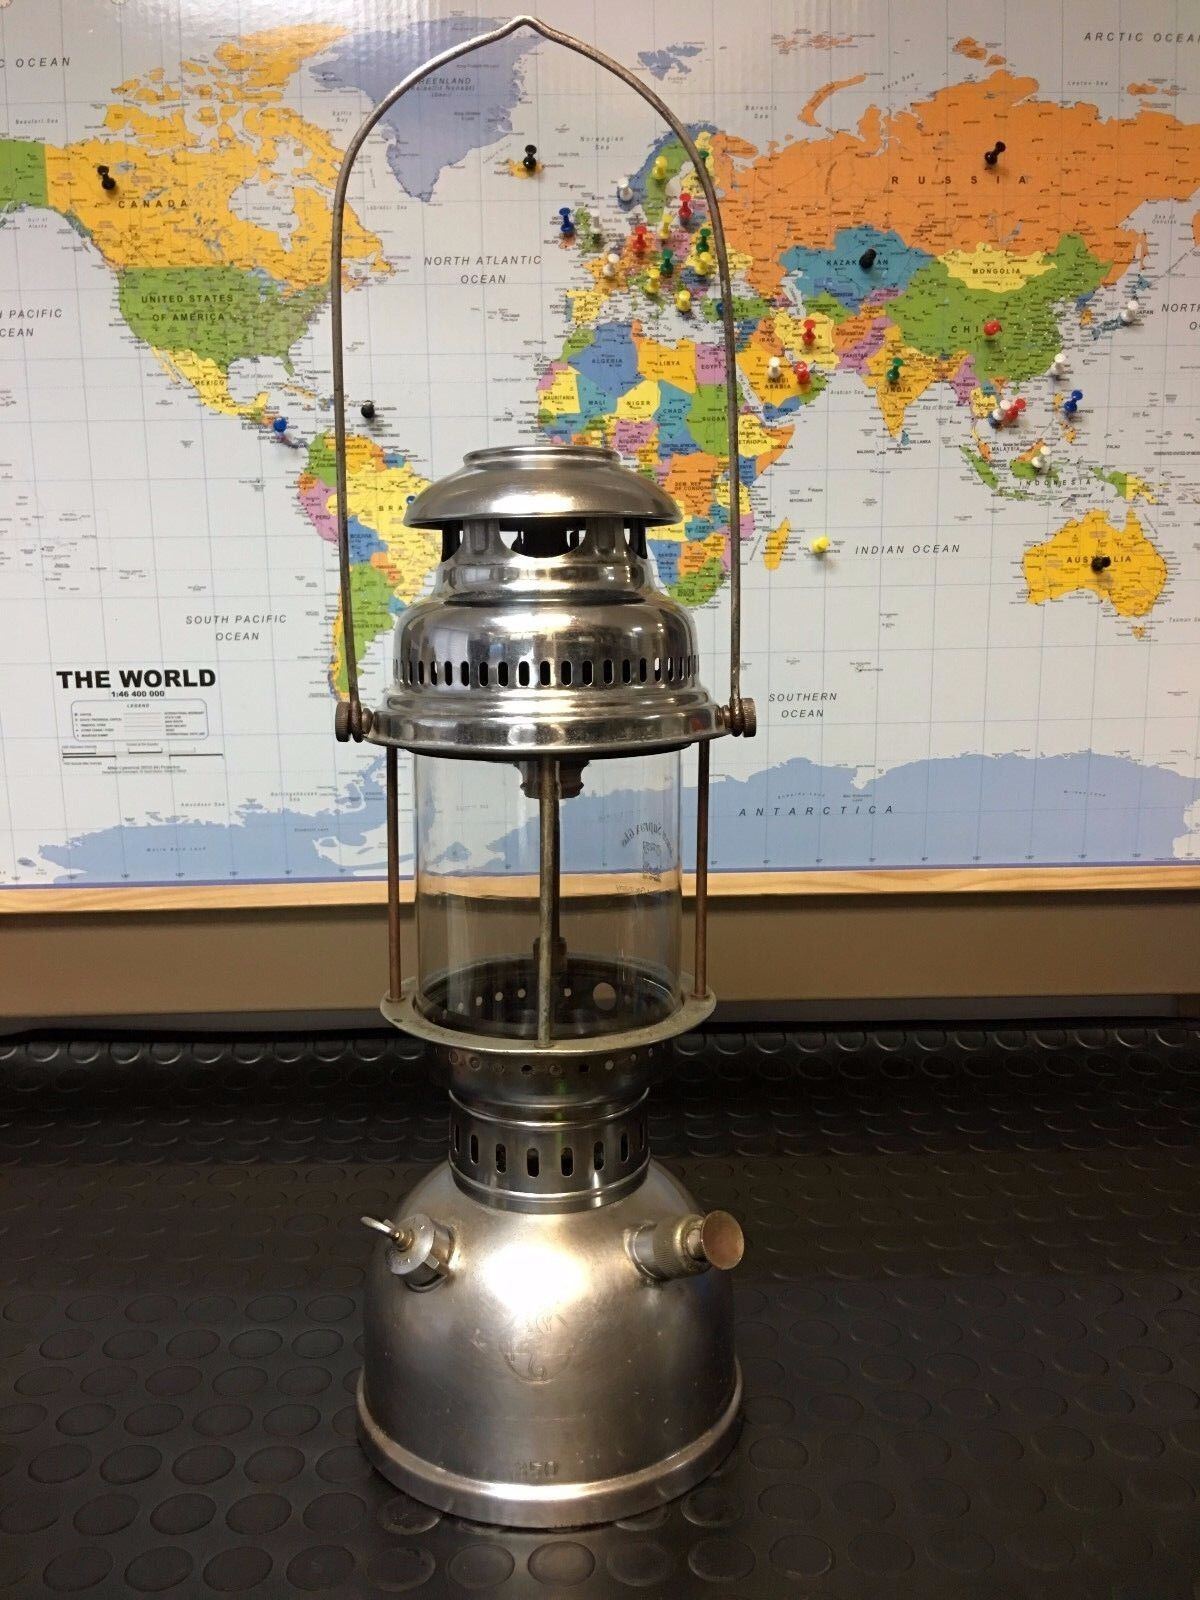 Portuguese Hipolito Biggest 350 CP  Pressure Lamp Paraffin Kepinkne Lantern  save 35% - 70% off